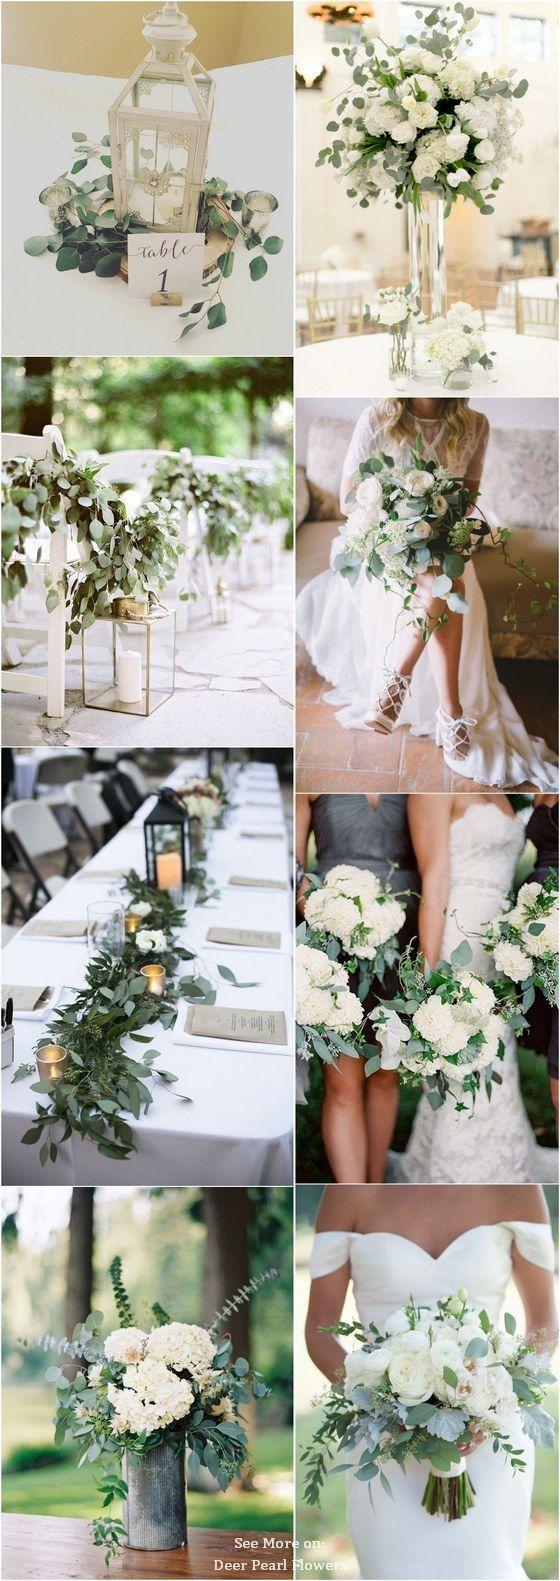 White wedding decoration ideas   Greenery Eucalyptus Wedding Decor Ideas  White wedding